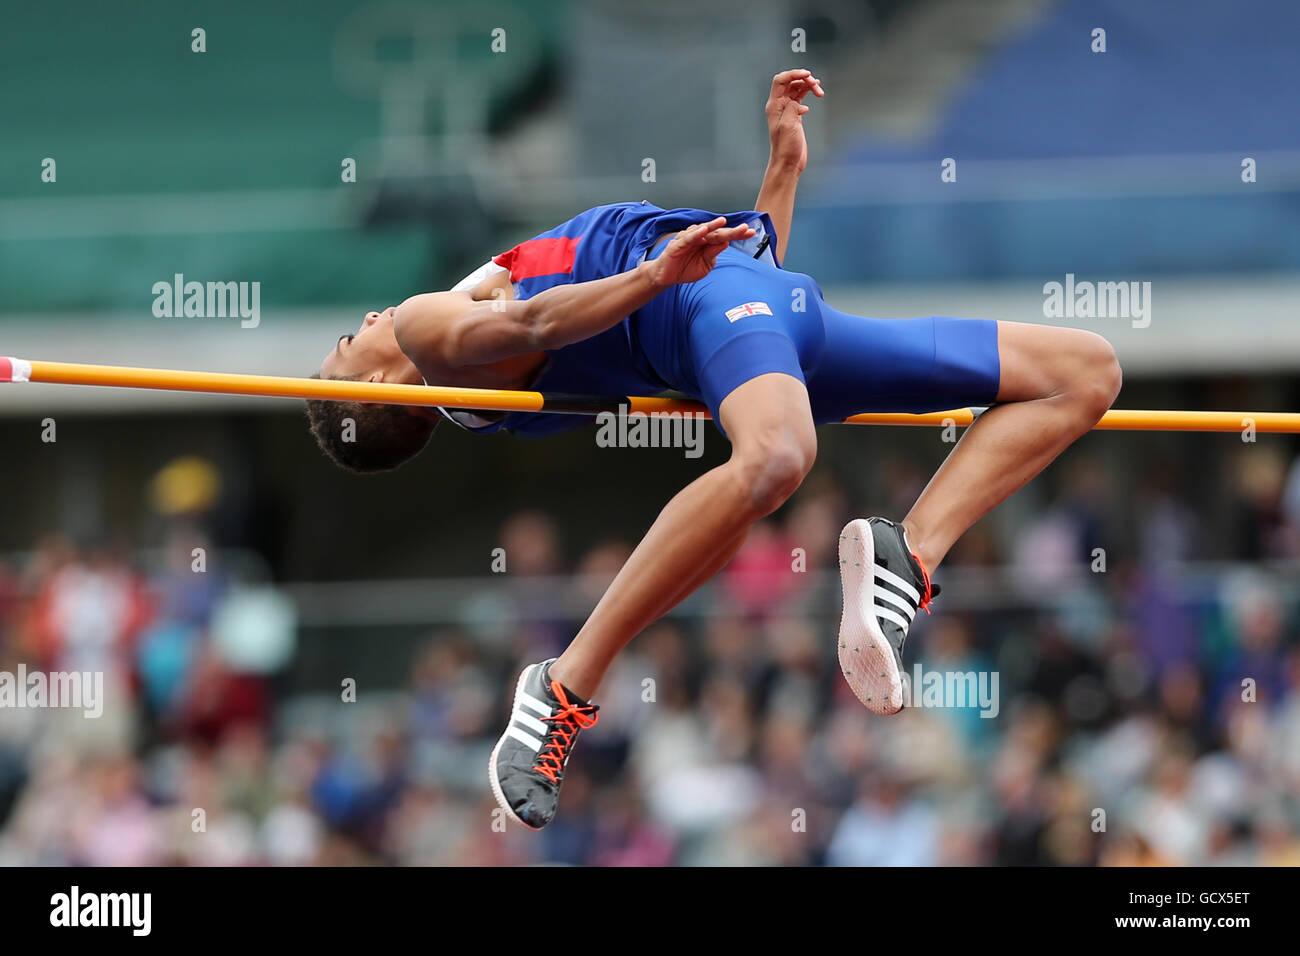 Tom GALE Men's High Jump Final, 2016 British Championships; Birmingham Alexander Stadium UK. - Stock Image